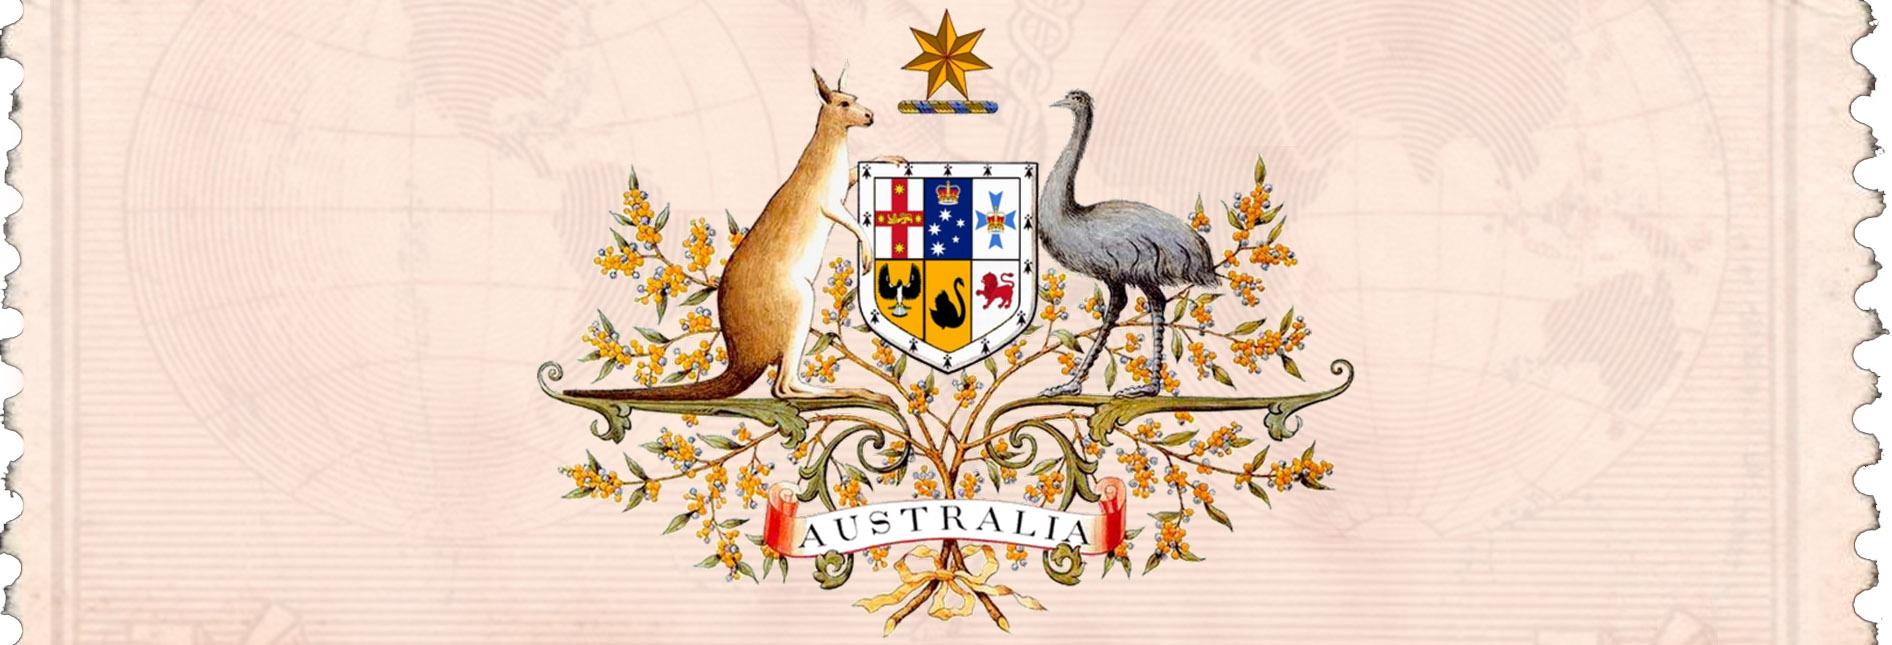 SIMBULOS DA AUSTRALIA